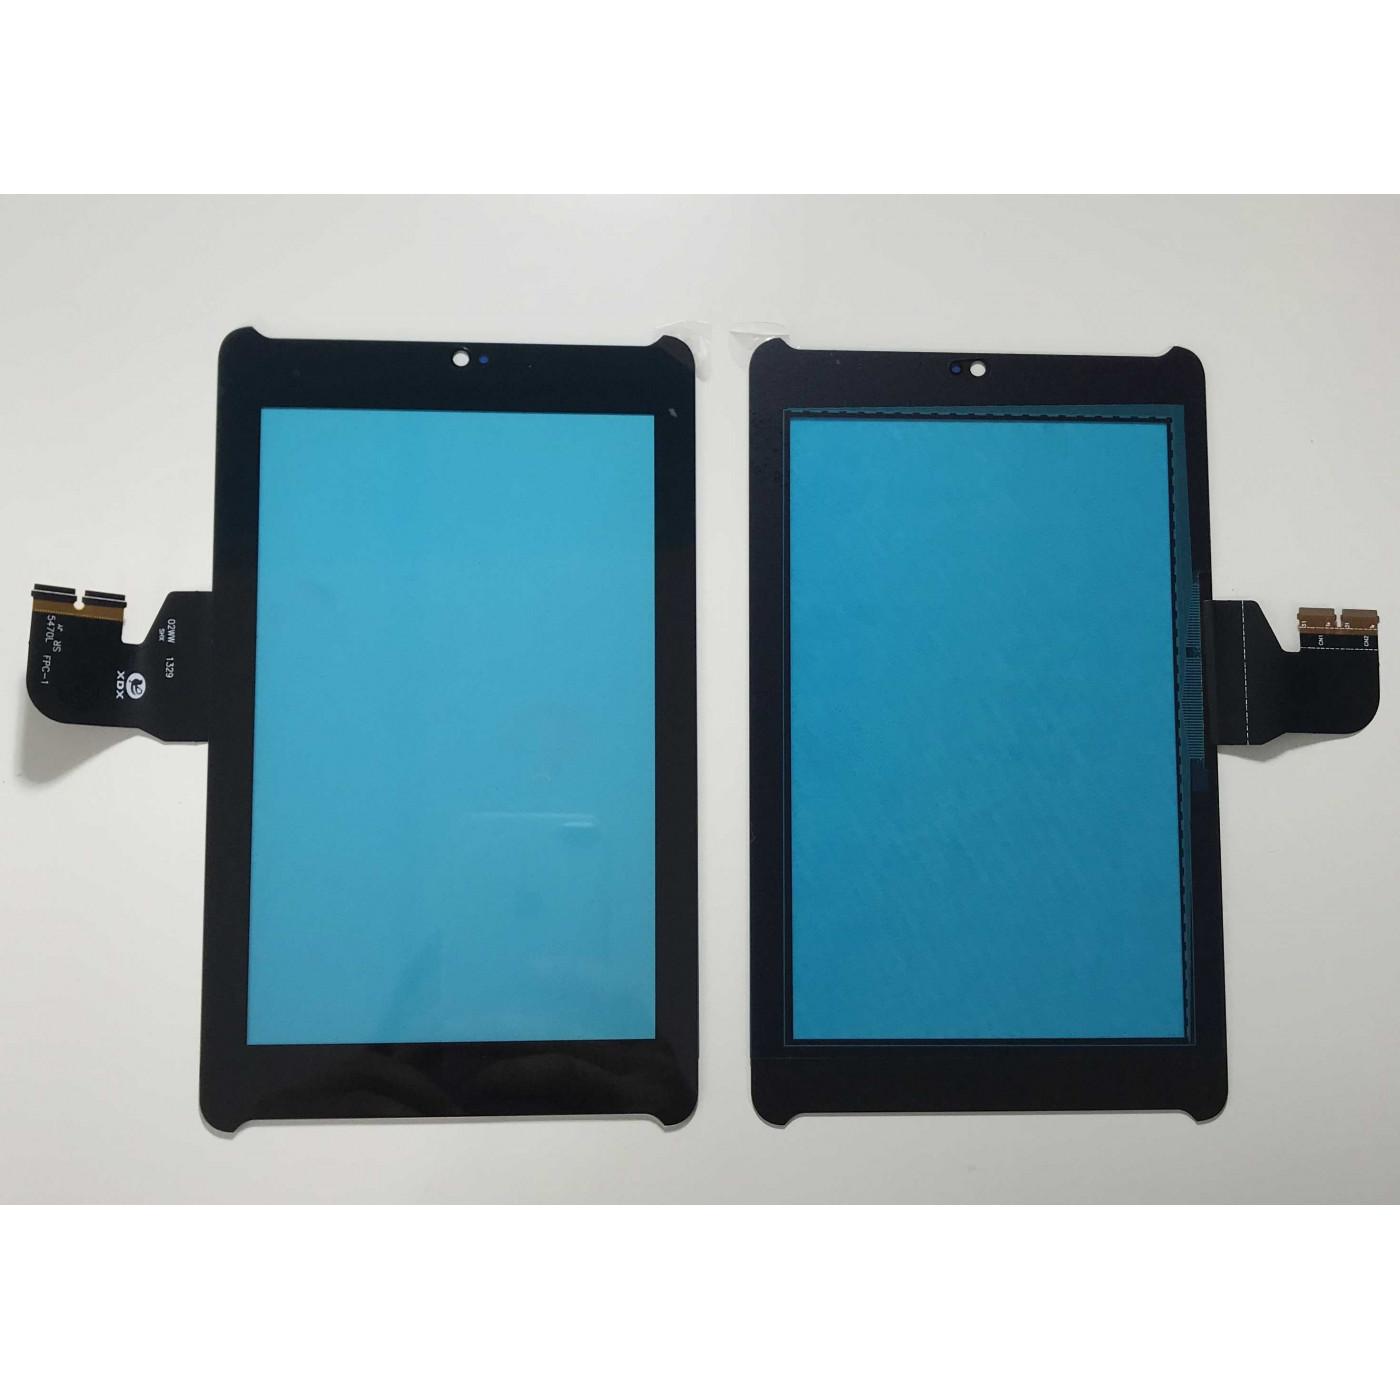 TOUCH SCREEN Asus Fonepad 7 ME373 ME373CG GLAS Digitizer 7.0 Schwarz